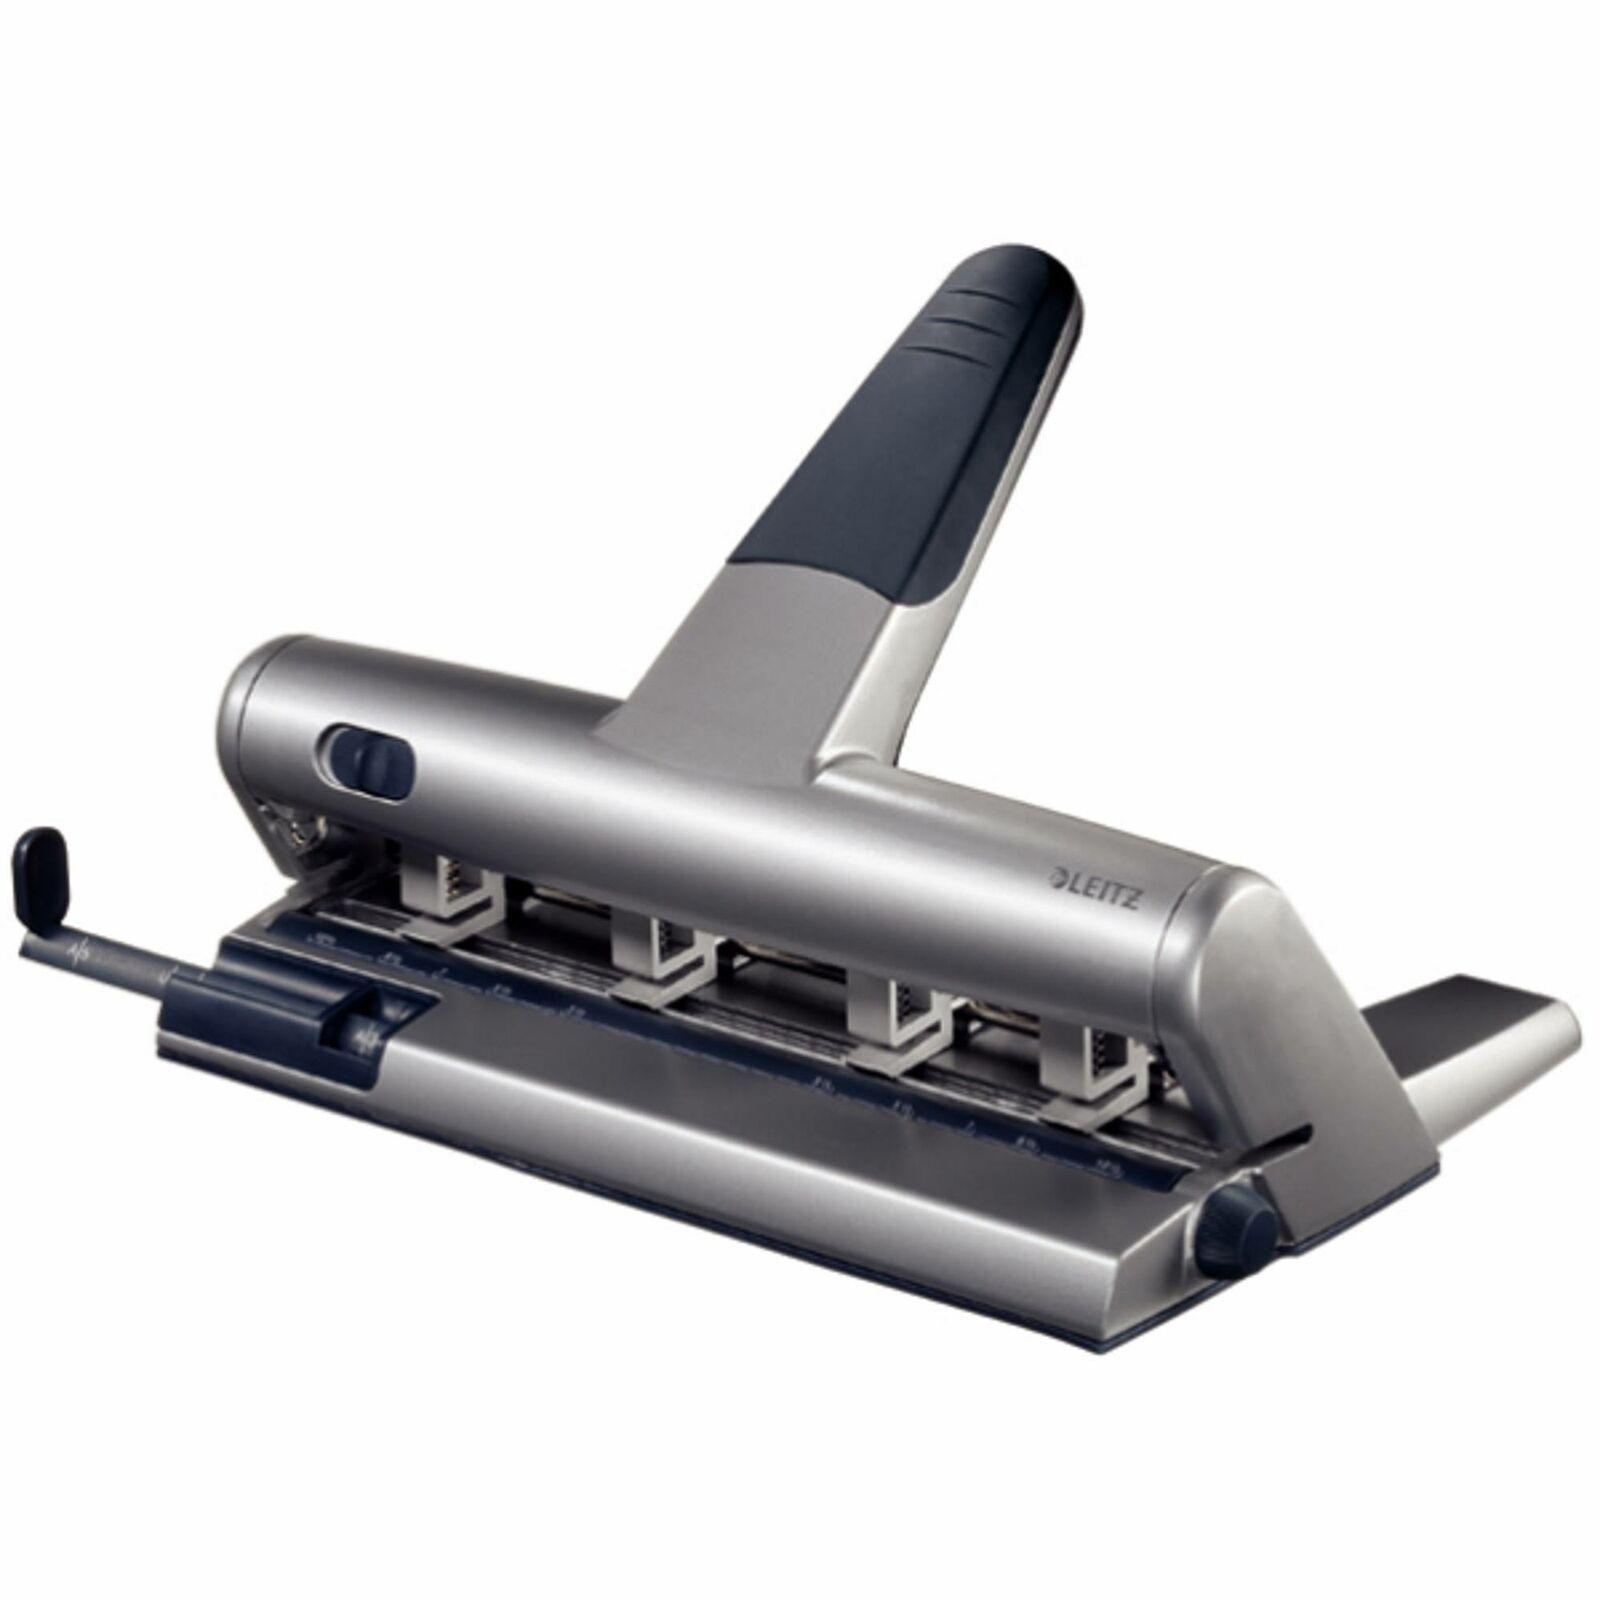 Mehrfachlocher Leitz 5114 AKTO, 30 Blatt, silber | Feinen Qualität  | Neuer Stil  | Großartig